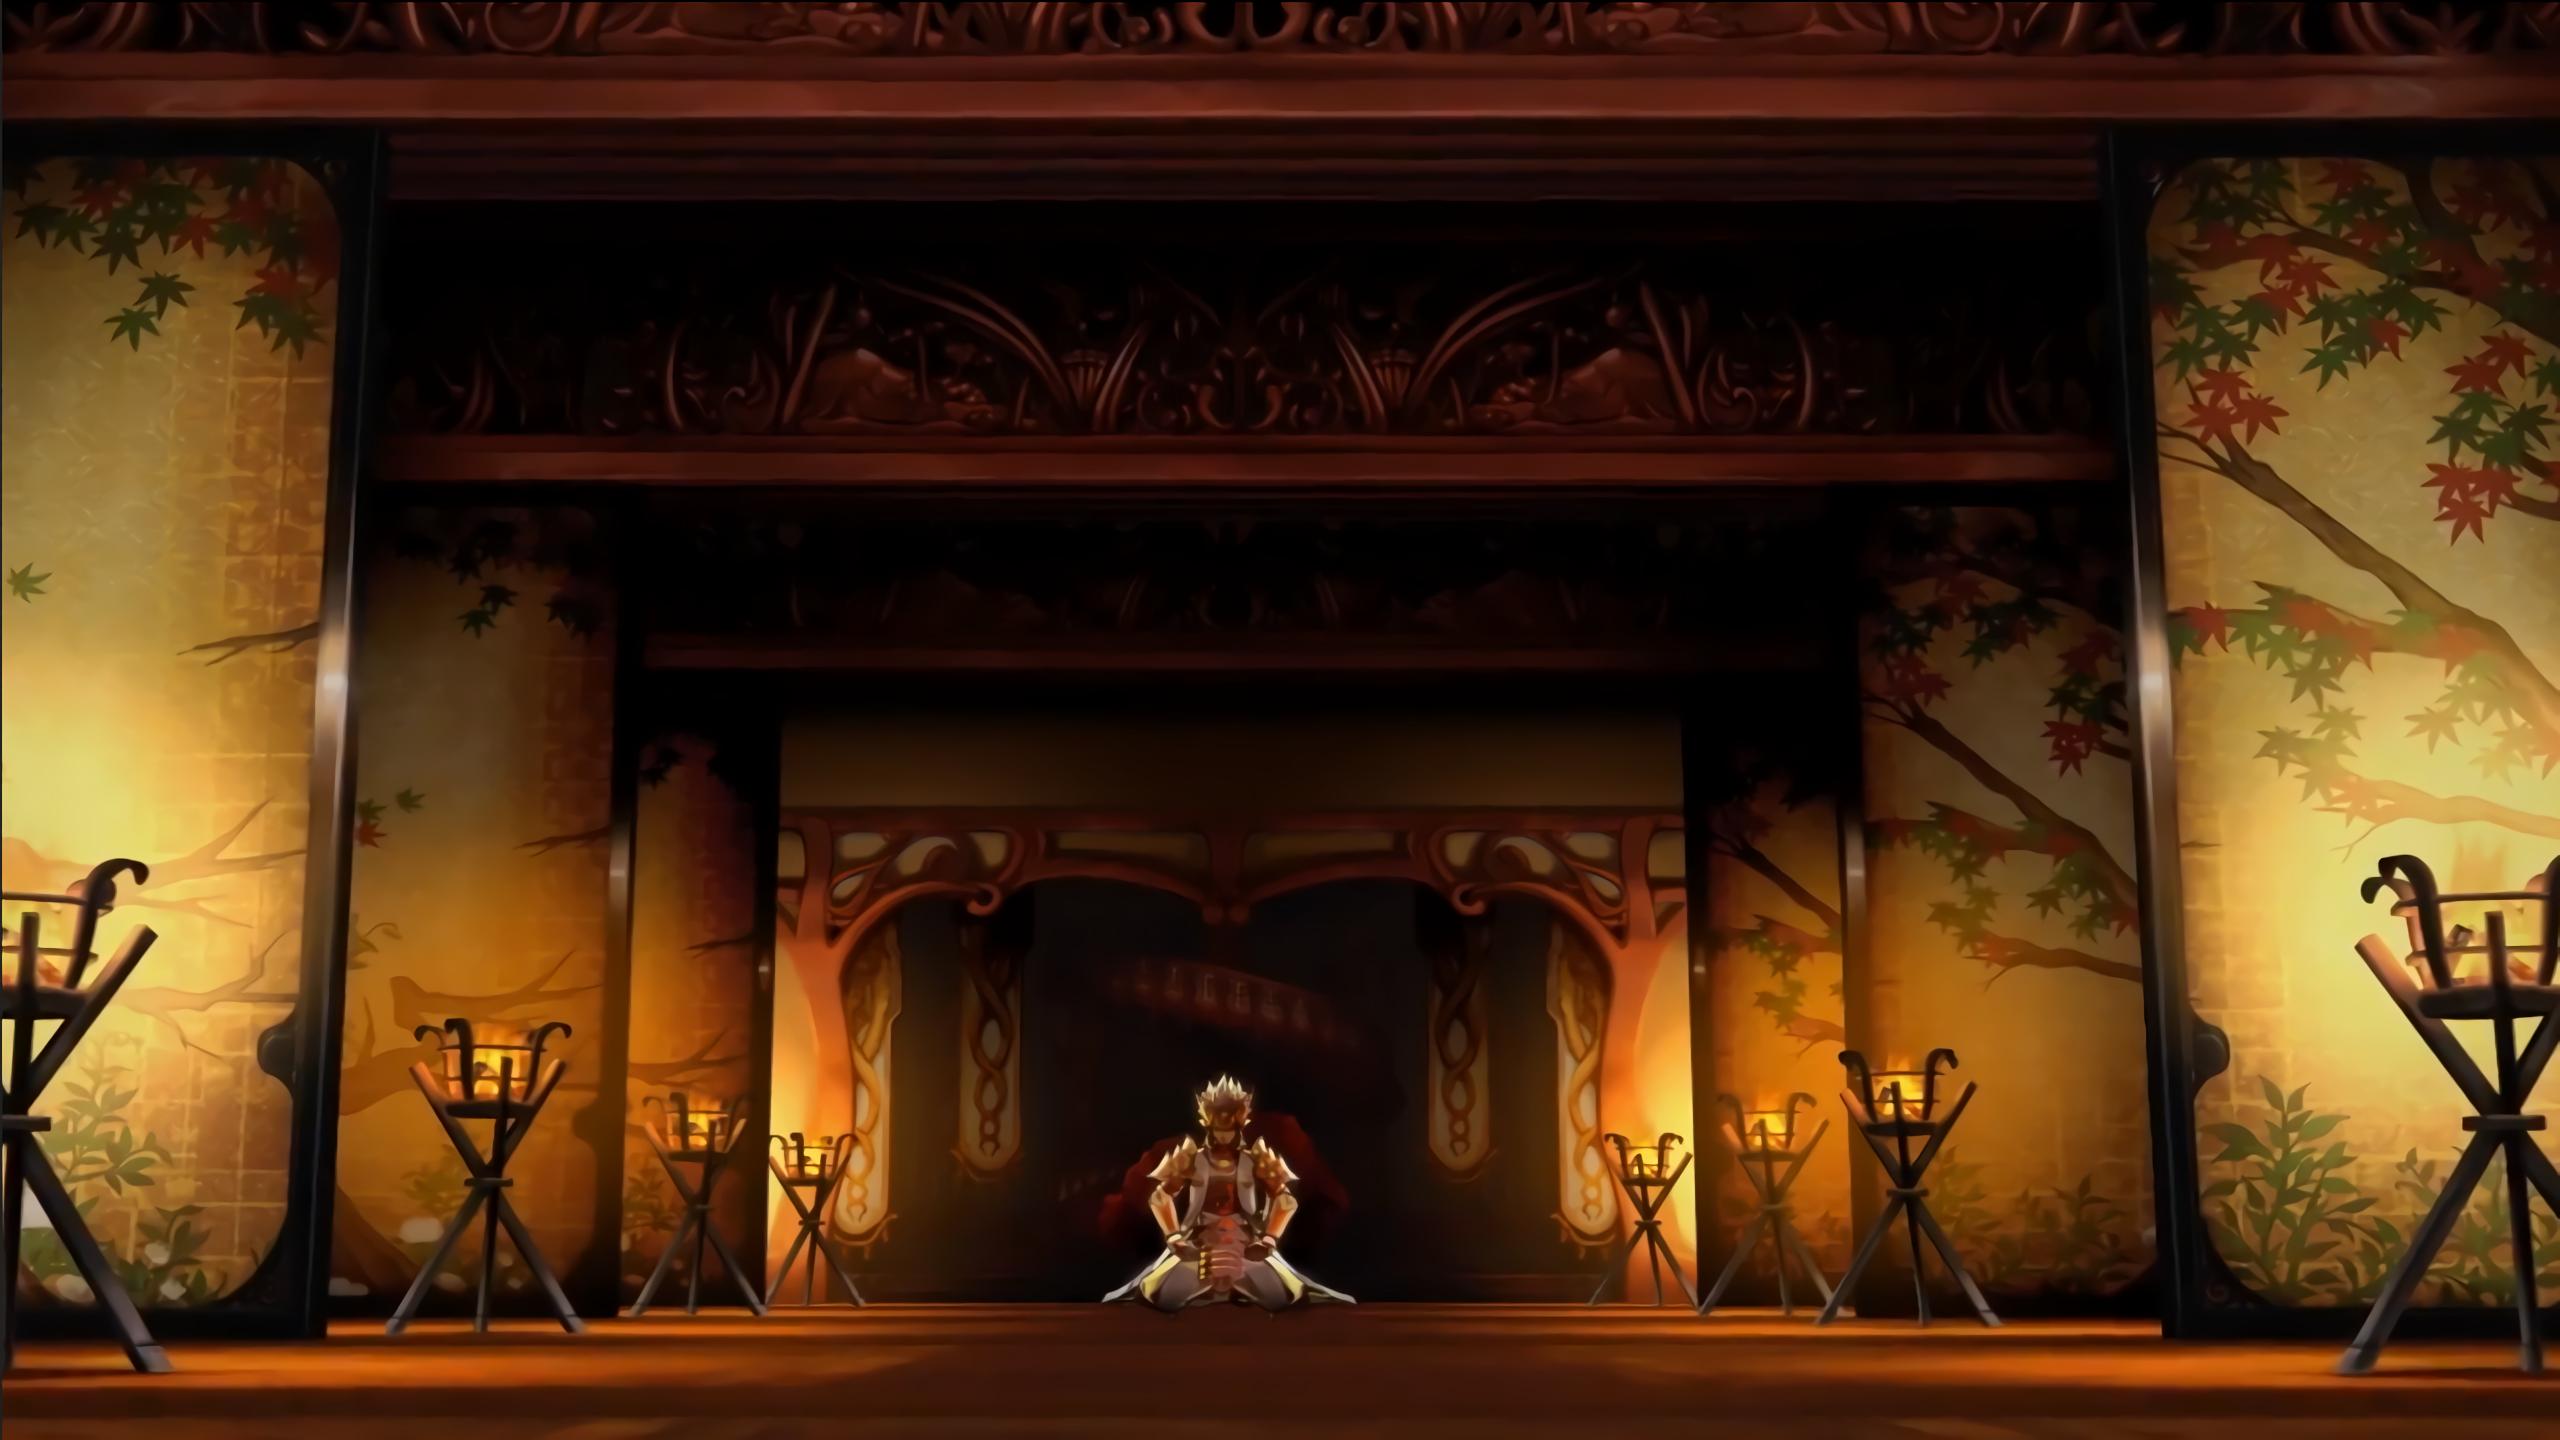 ♕ SPIRIT BRINGERS: EMPYREAN REALM. (SAGA DE BYNQUISTERR) - Página 2 Fire_emblem_fates_waiting_ryoma_by_kaz_kirigiri-da0hom3